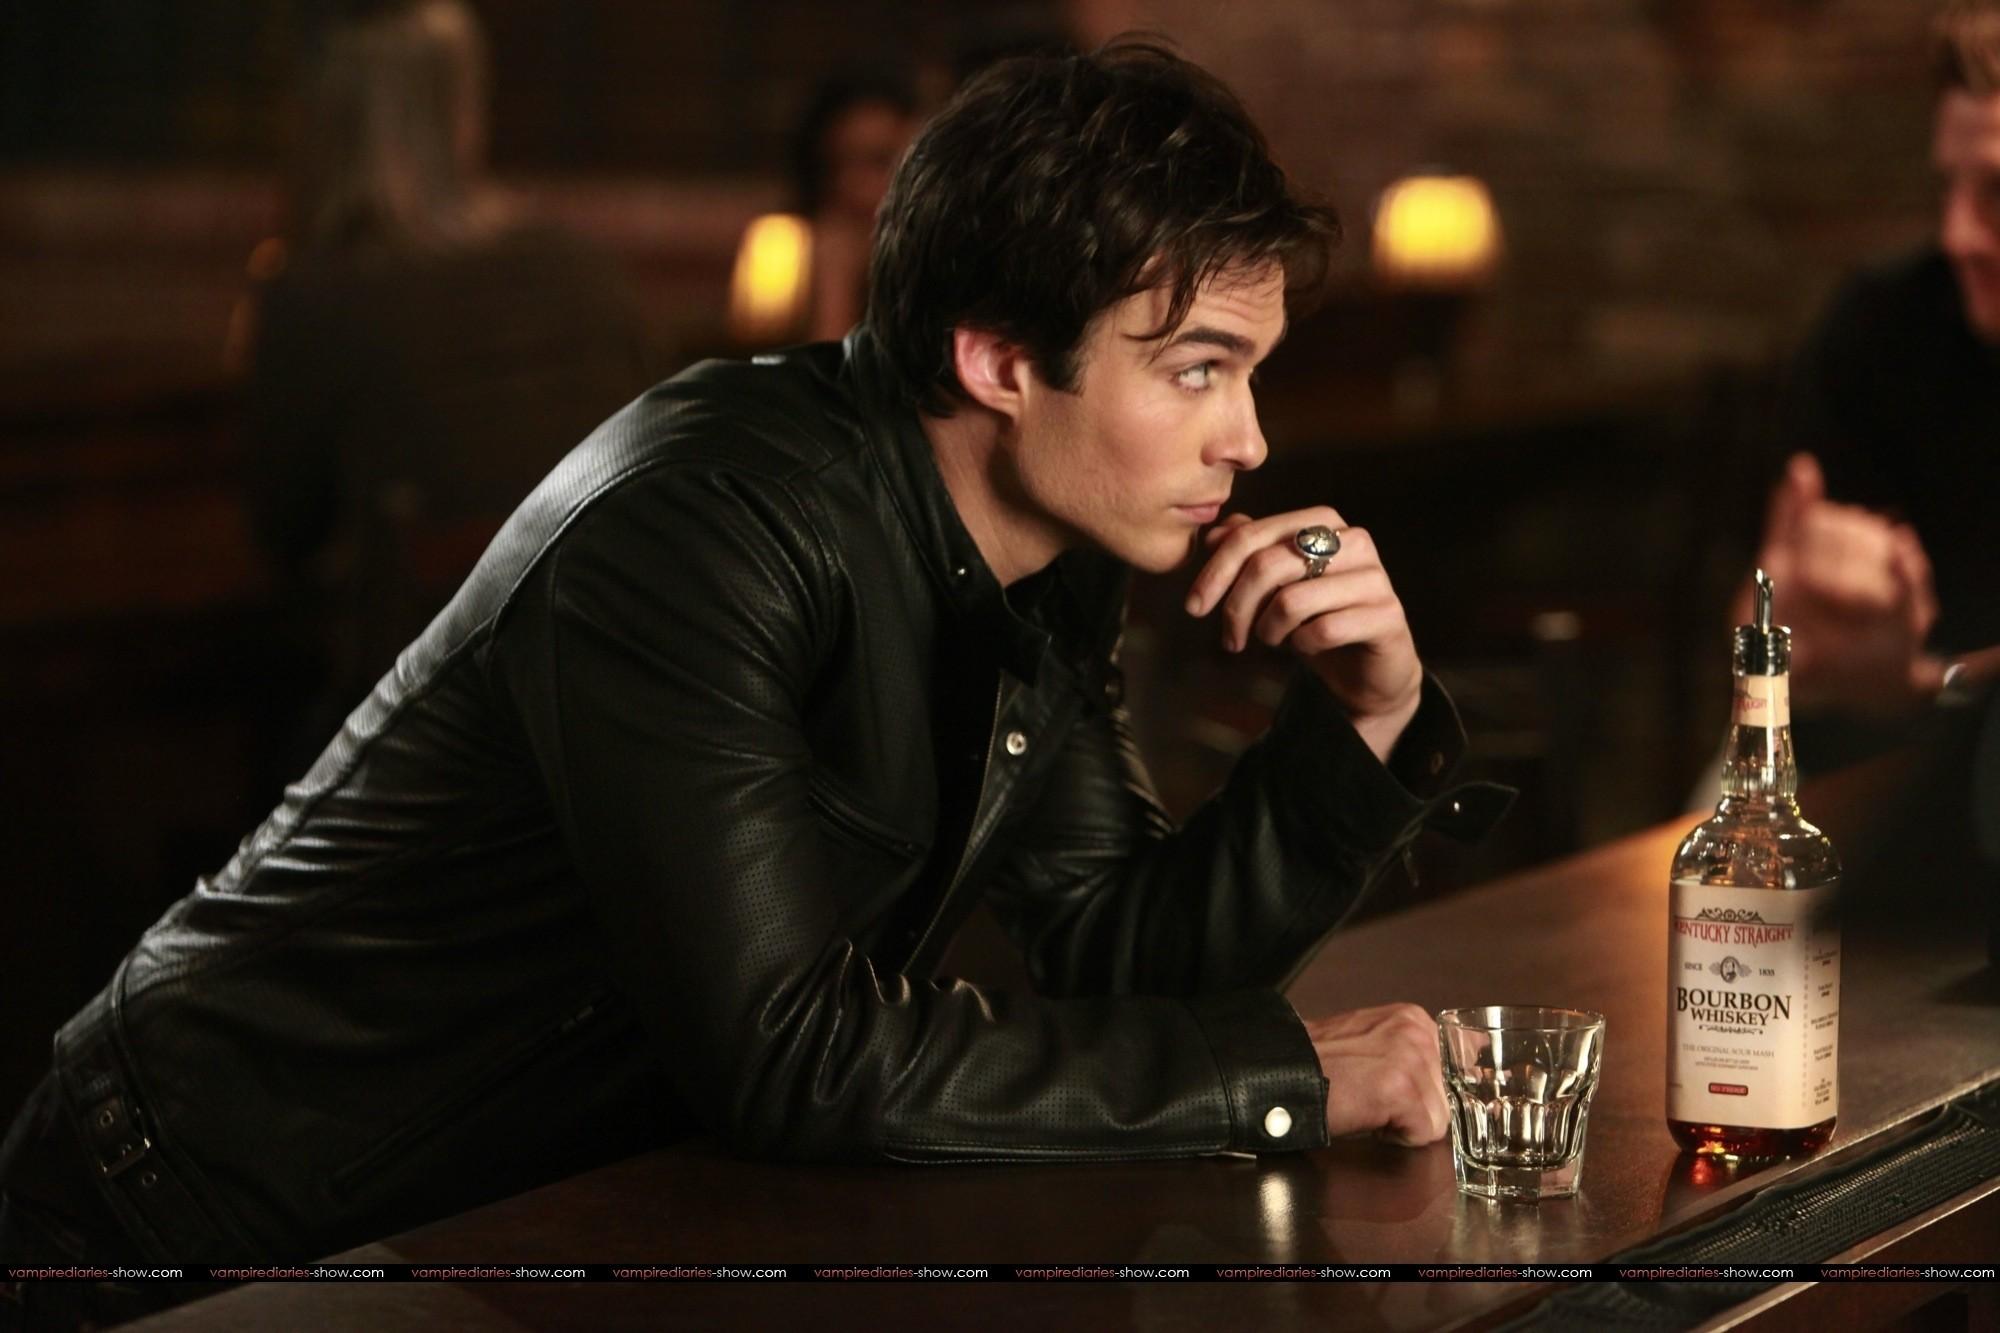 Damon Salvatore Vampire Diaries Wallpaper (76+ images)